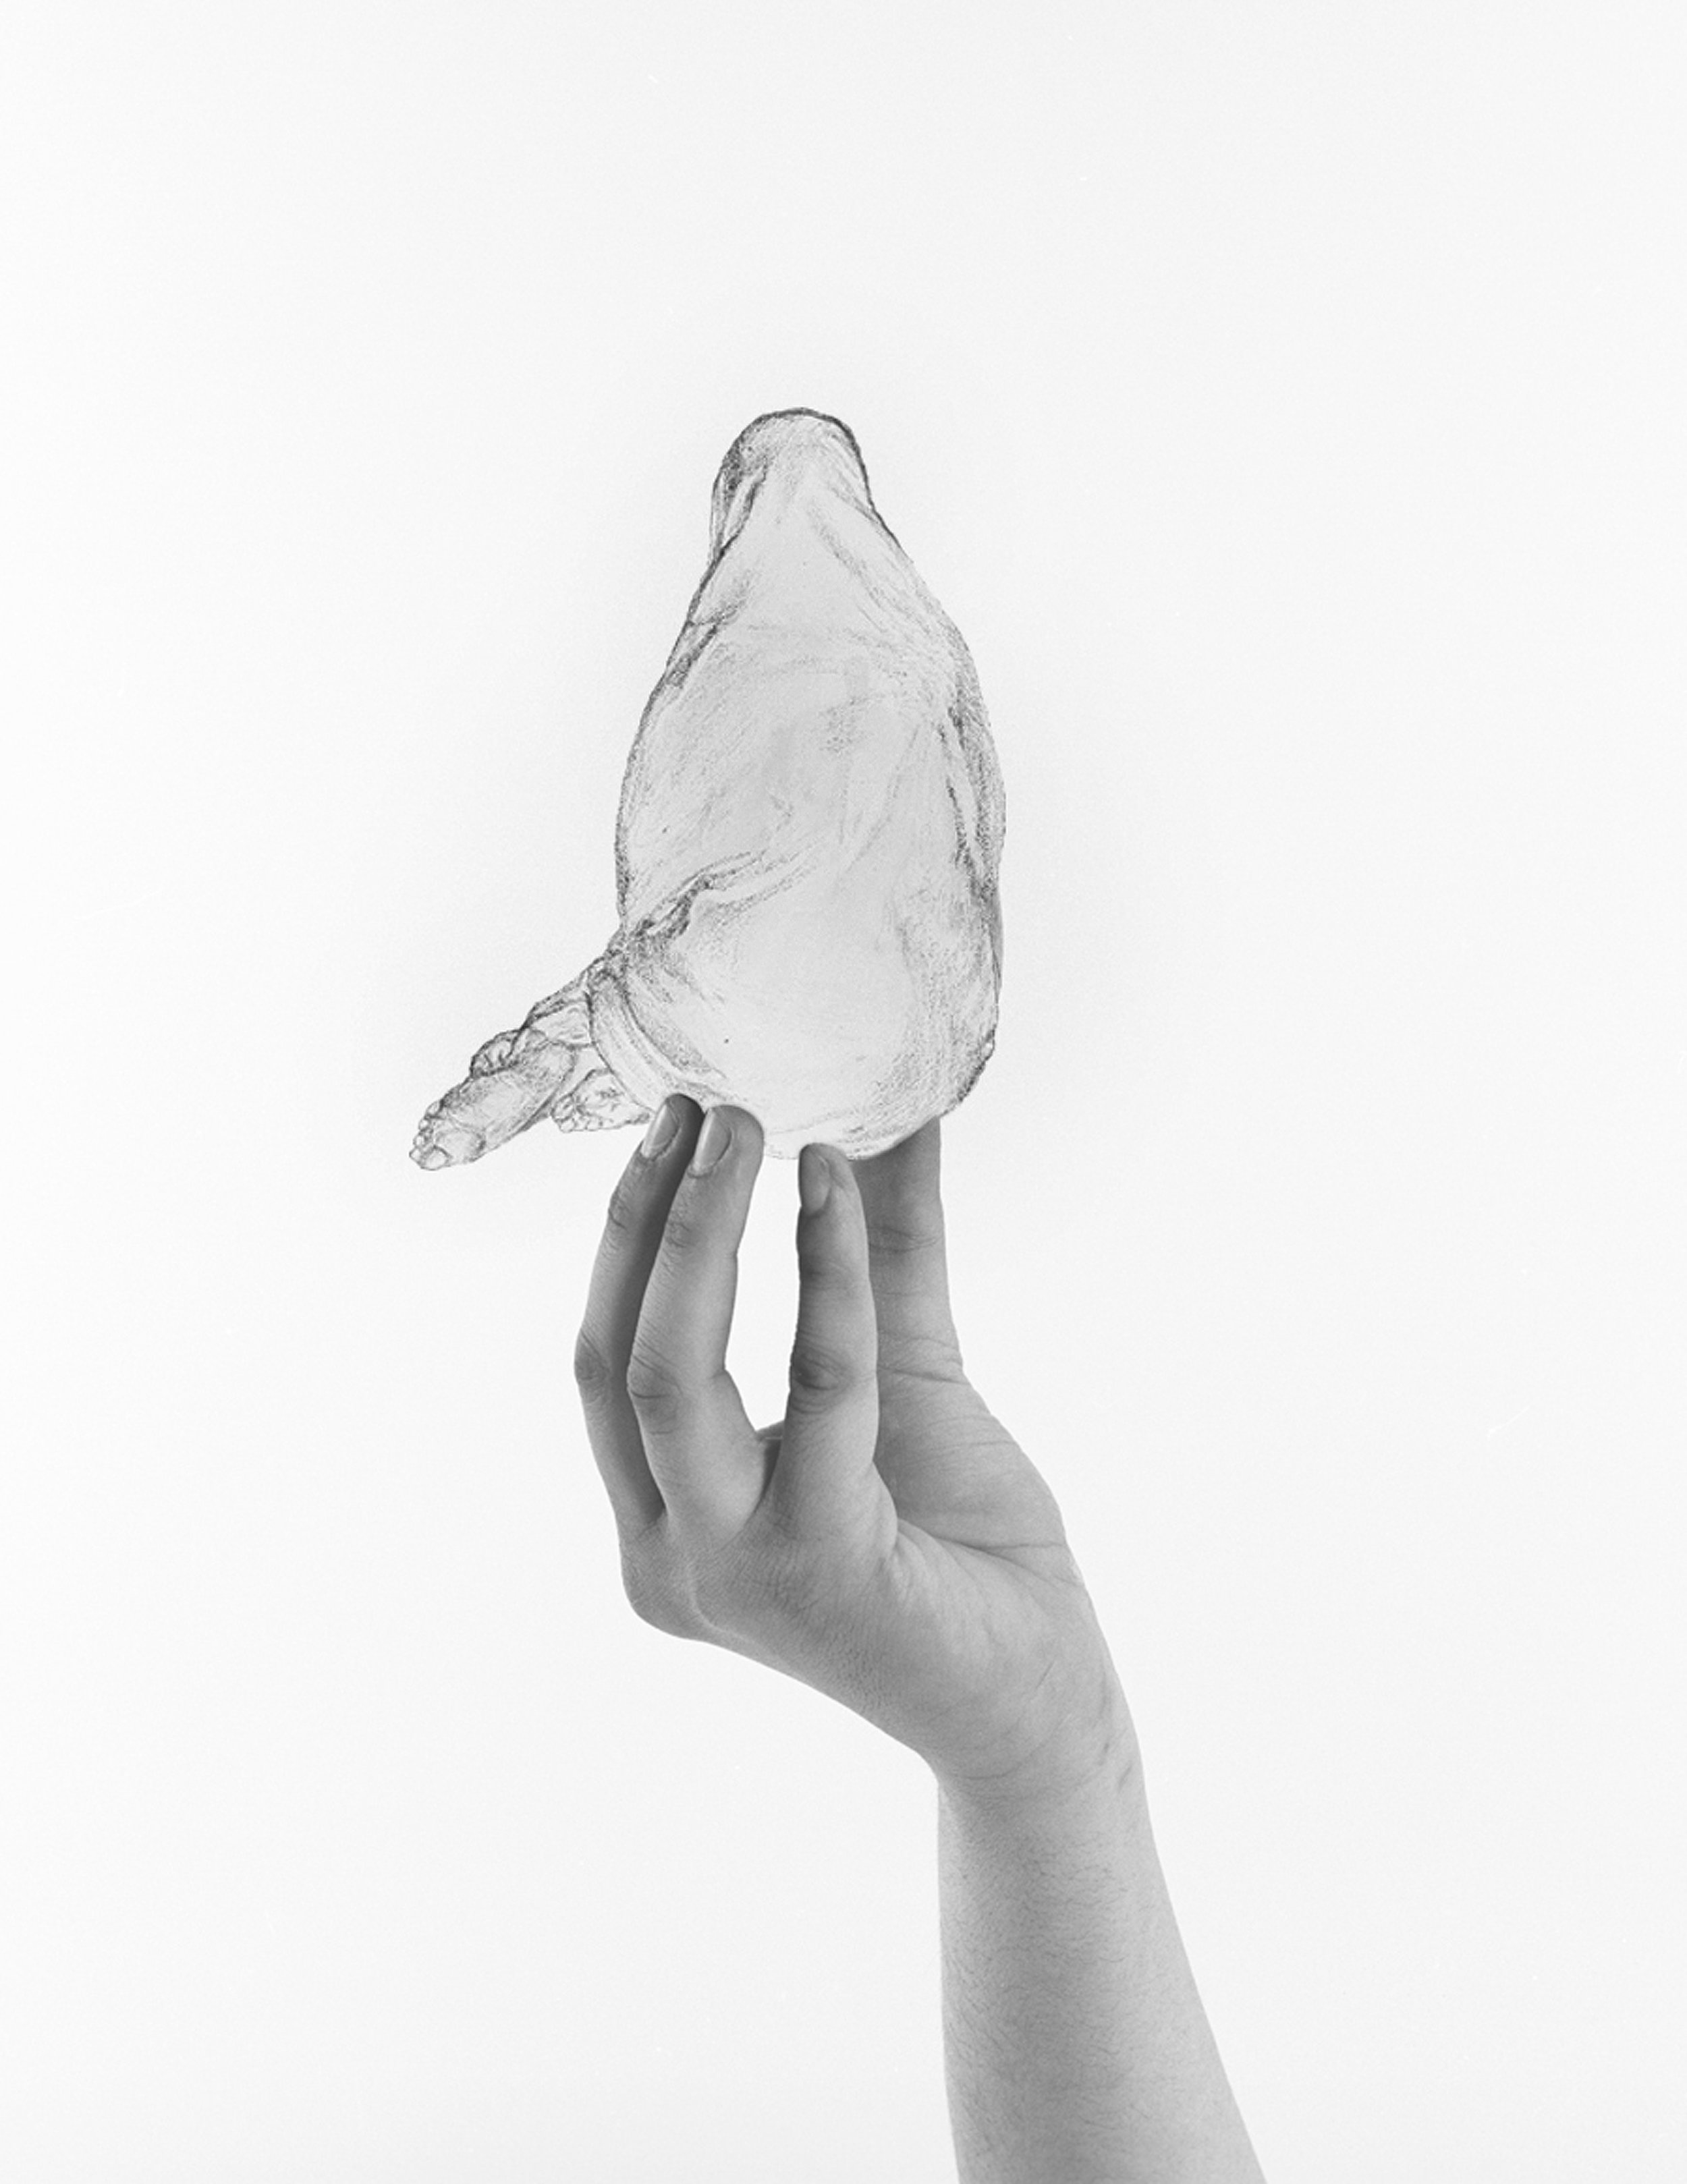 Pear Shape, Arwa Abouon, Digital Print. Image courtesy of The Third Line, Dubai